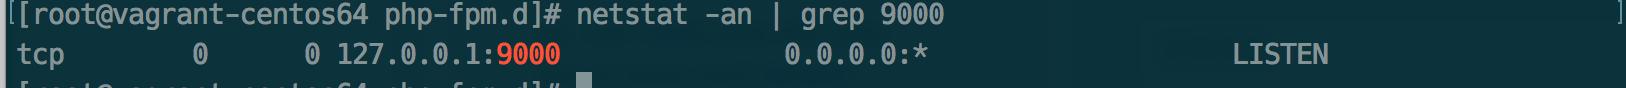 查看php-fpm 监听端口